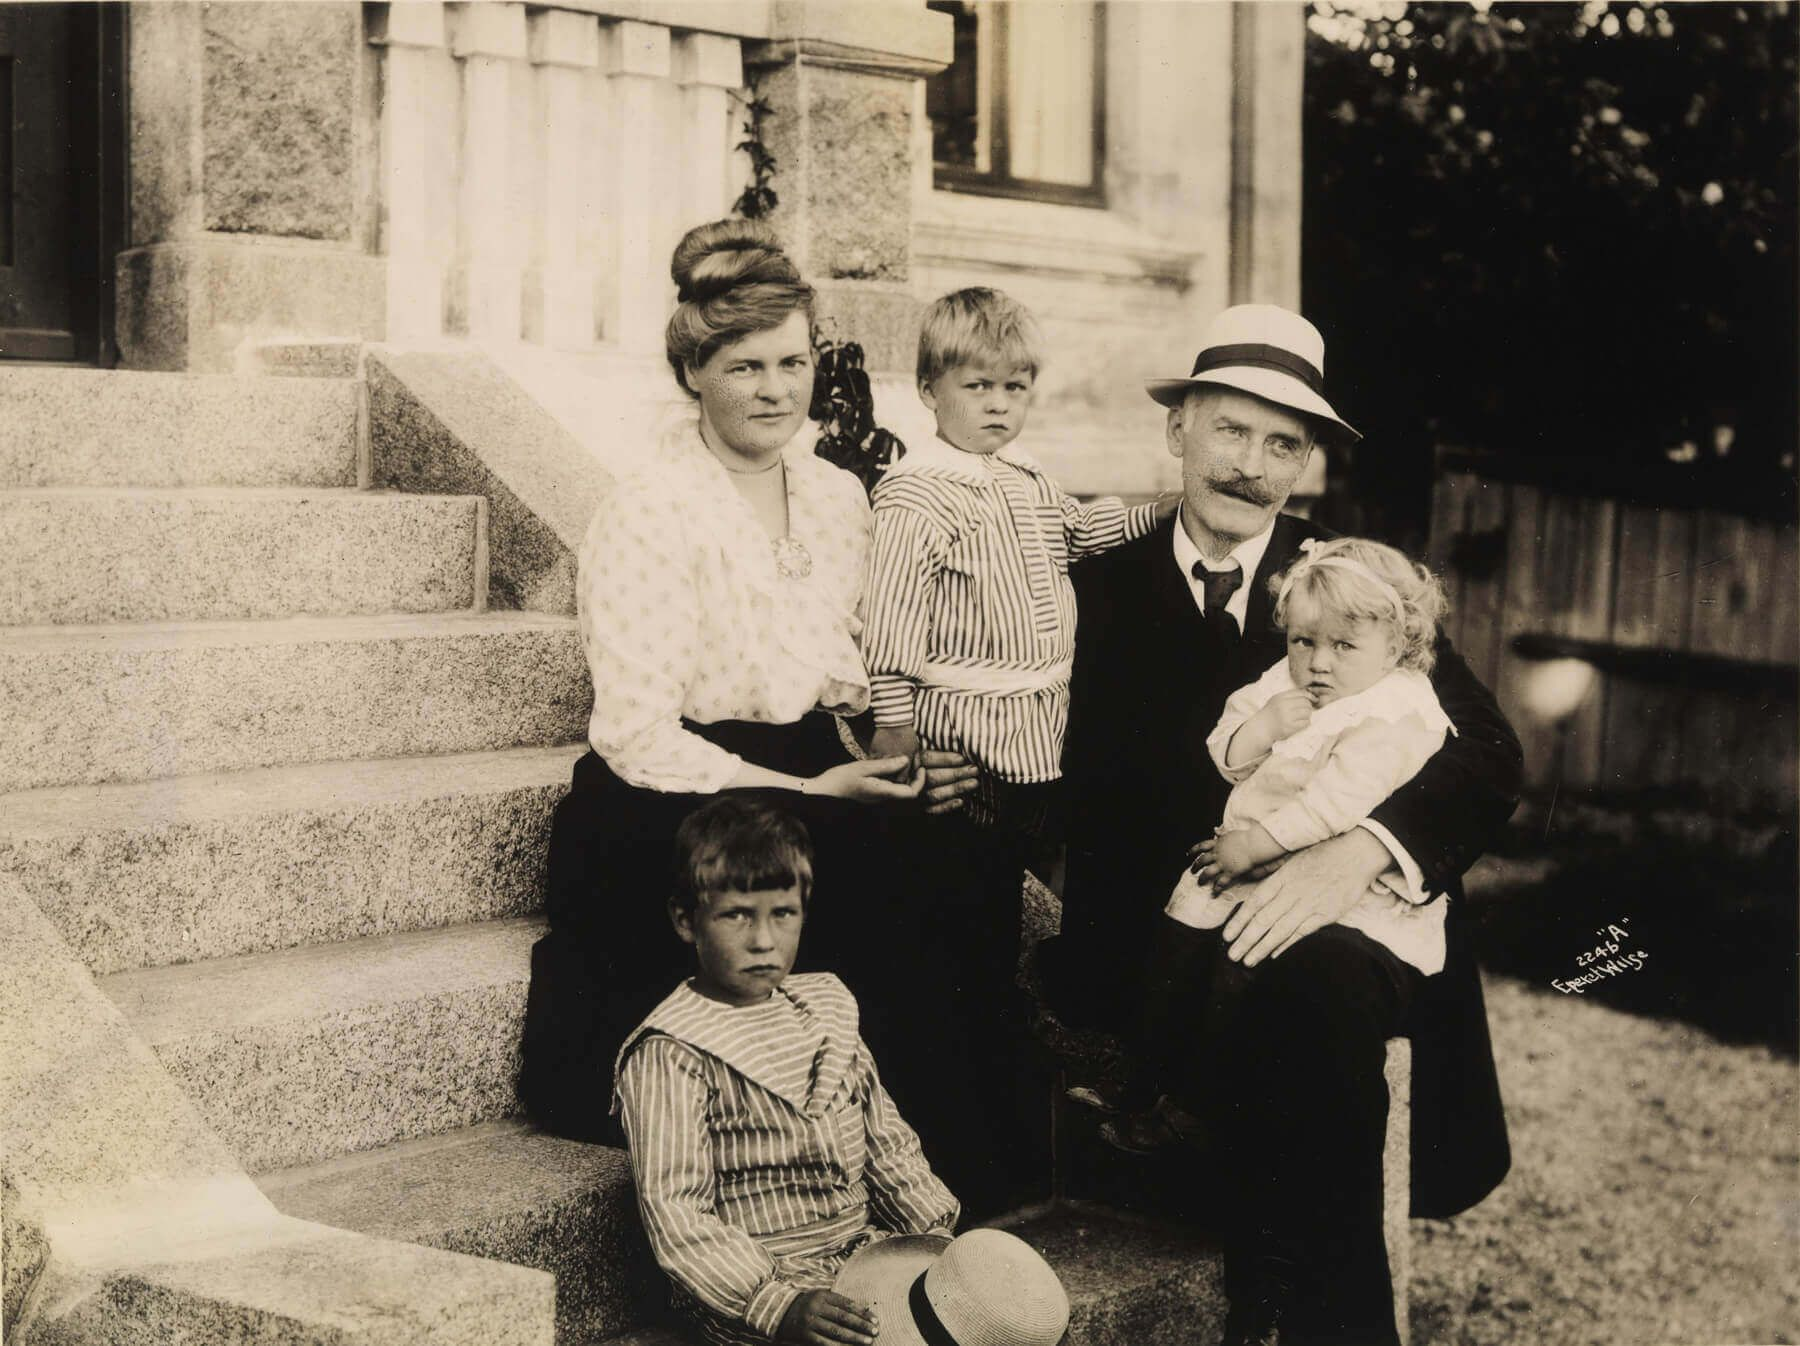 Кнут Гамсун с семьей, Ларвик, 1917 г. / Nasjonalbiblioteket, National Library of Norway